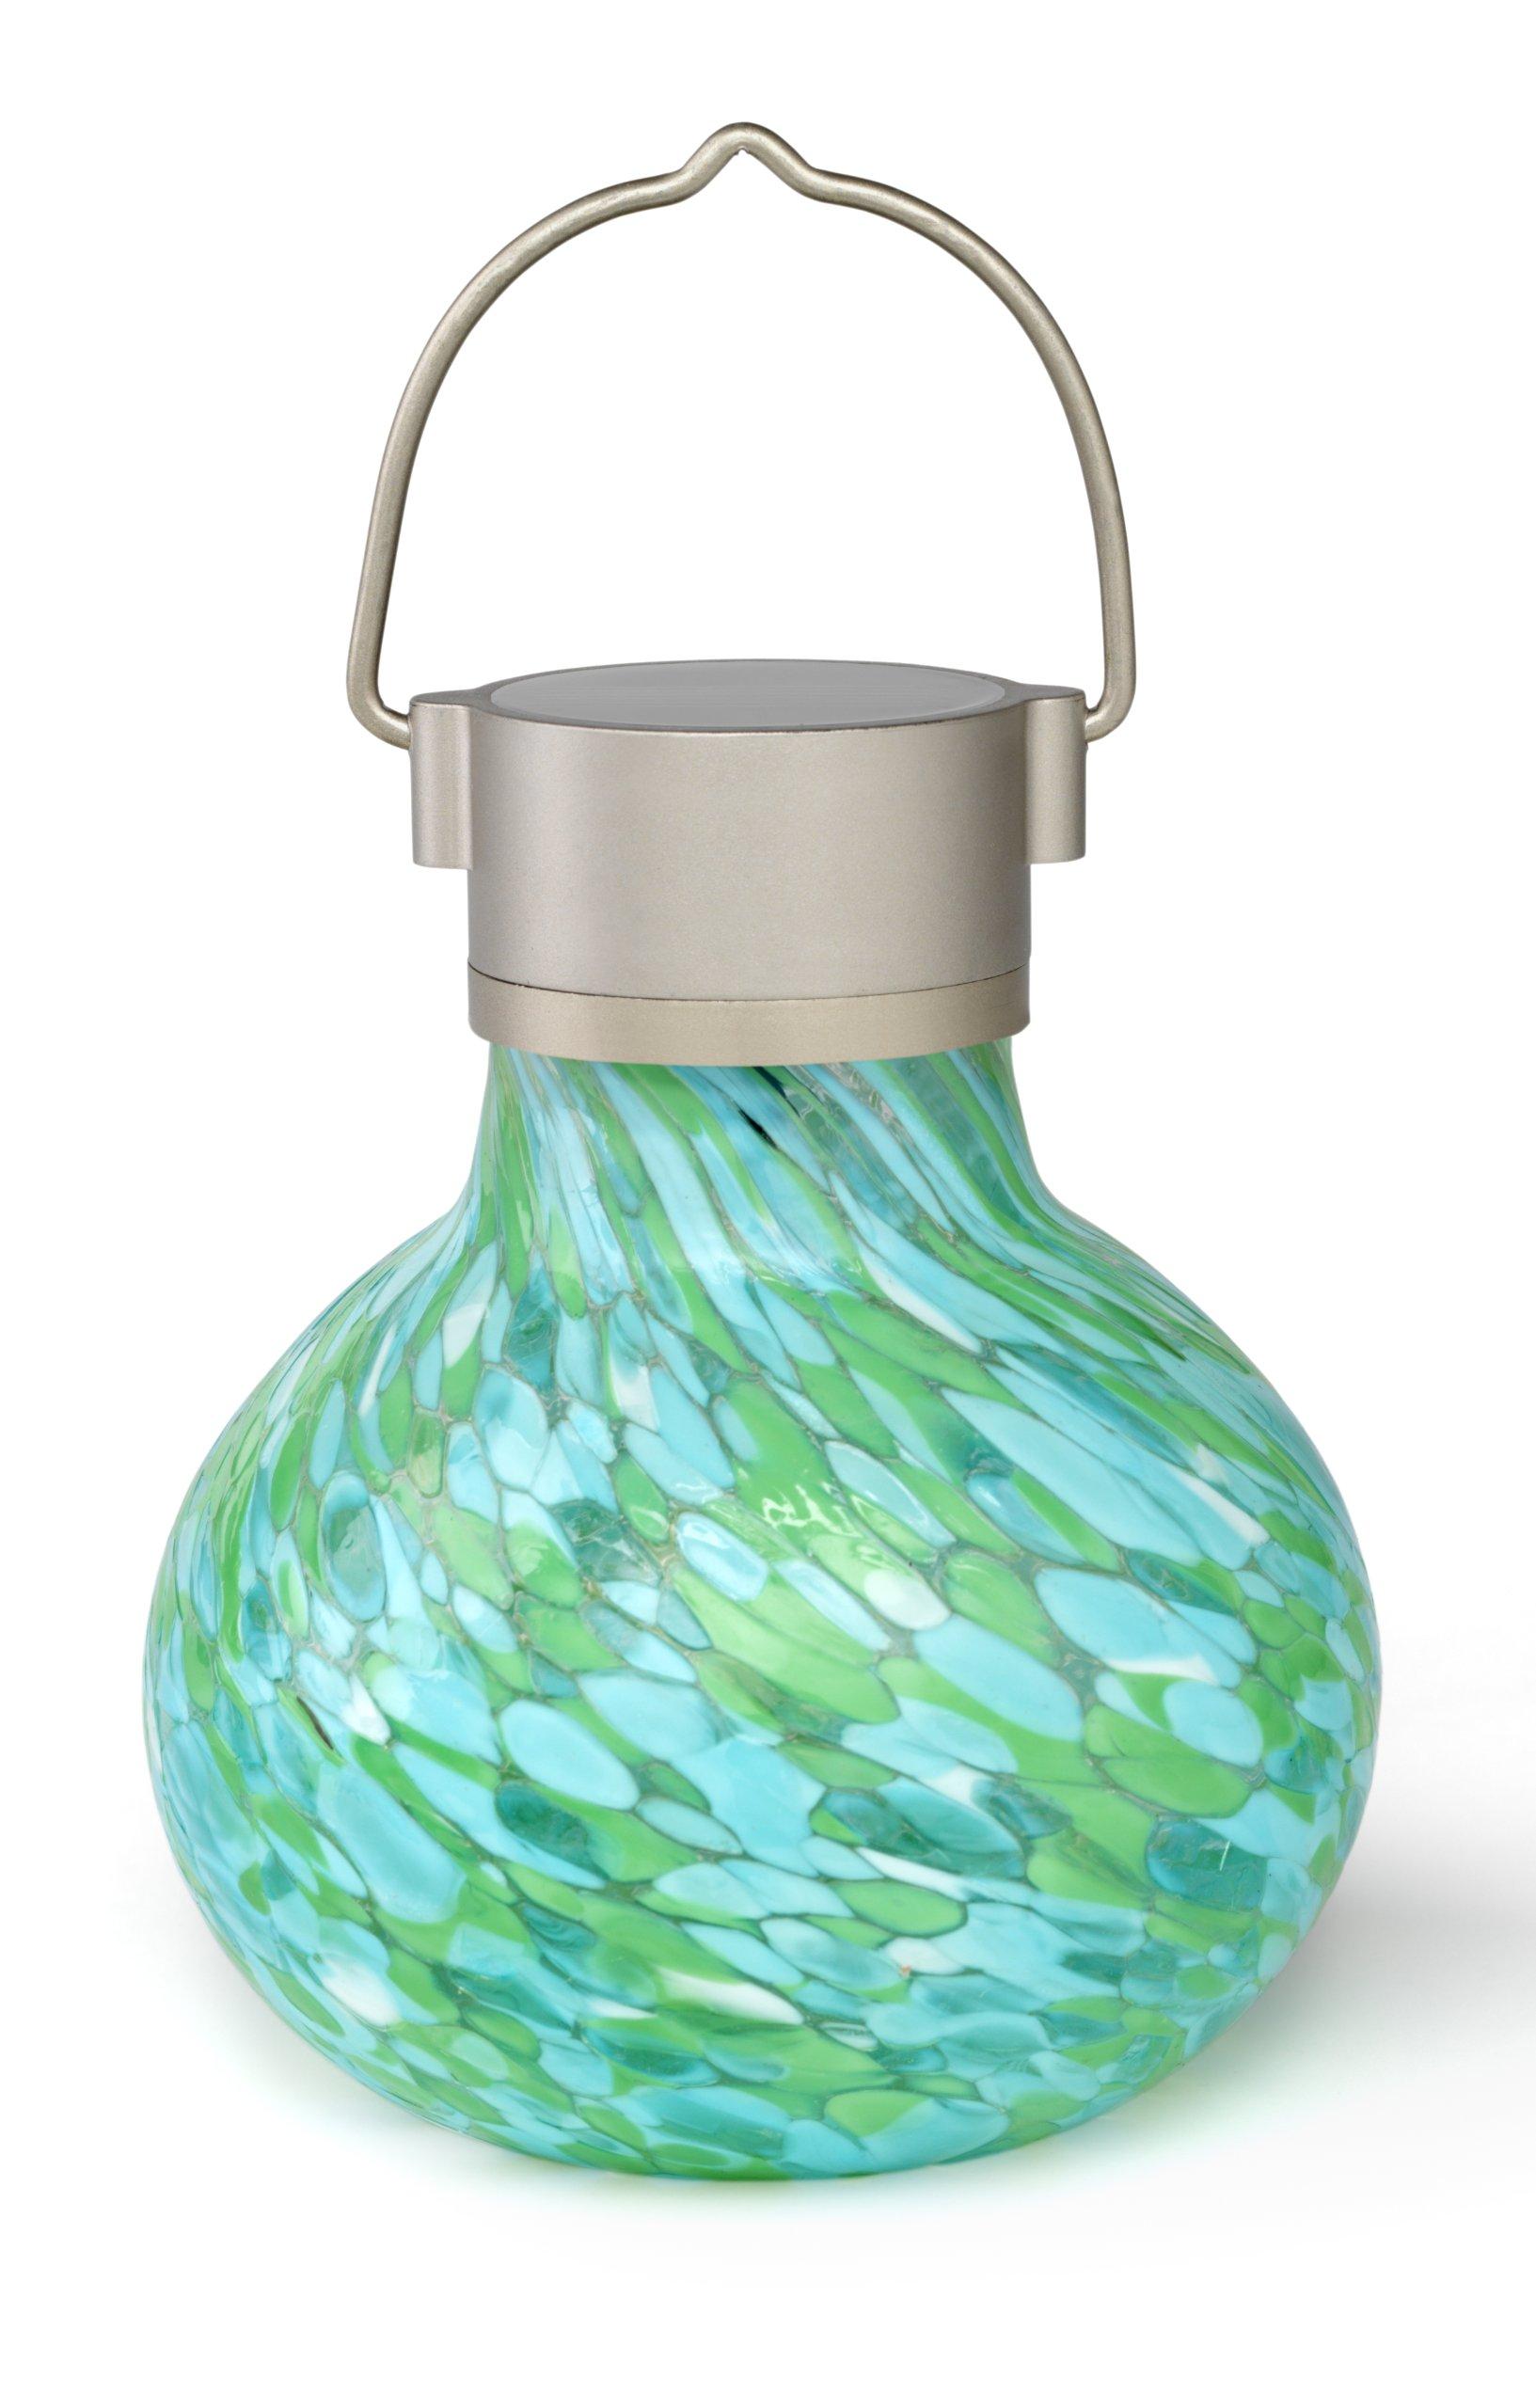 Allsop Home and Garden Solar Tea Lantern, Handblown Glass with Solar Panel and LED Light, Weather-Resistant for Outdoor Deck, Patio, Garden, Wedding, Mint, 1-Count by Allsop Home and Garden